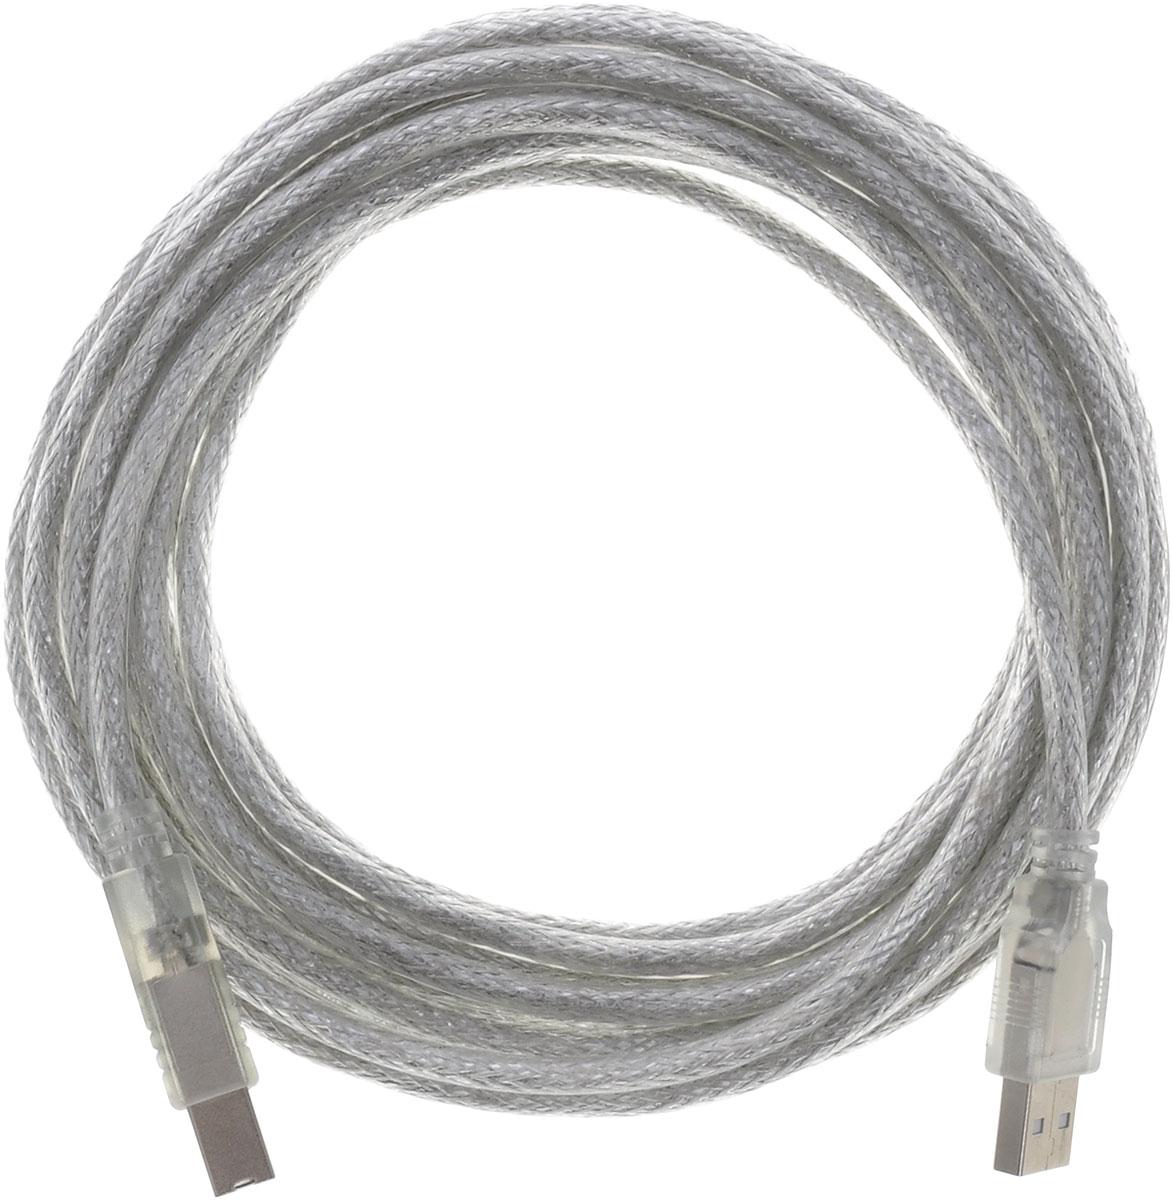 Greenconnect Premium GCR-UPC2M-BD2S, Clear кабель USB 5.0 м